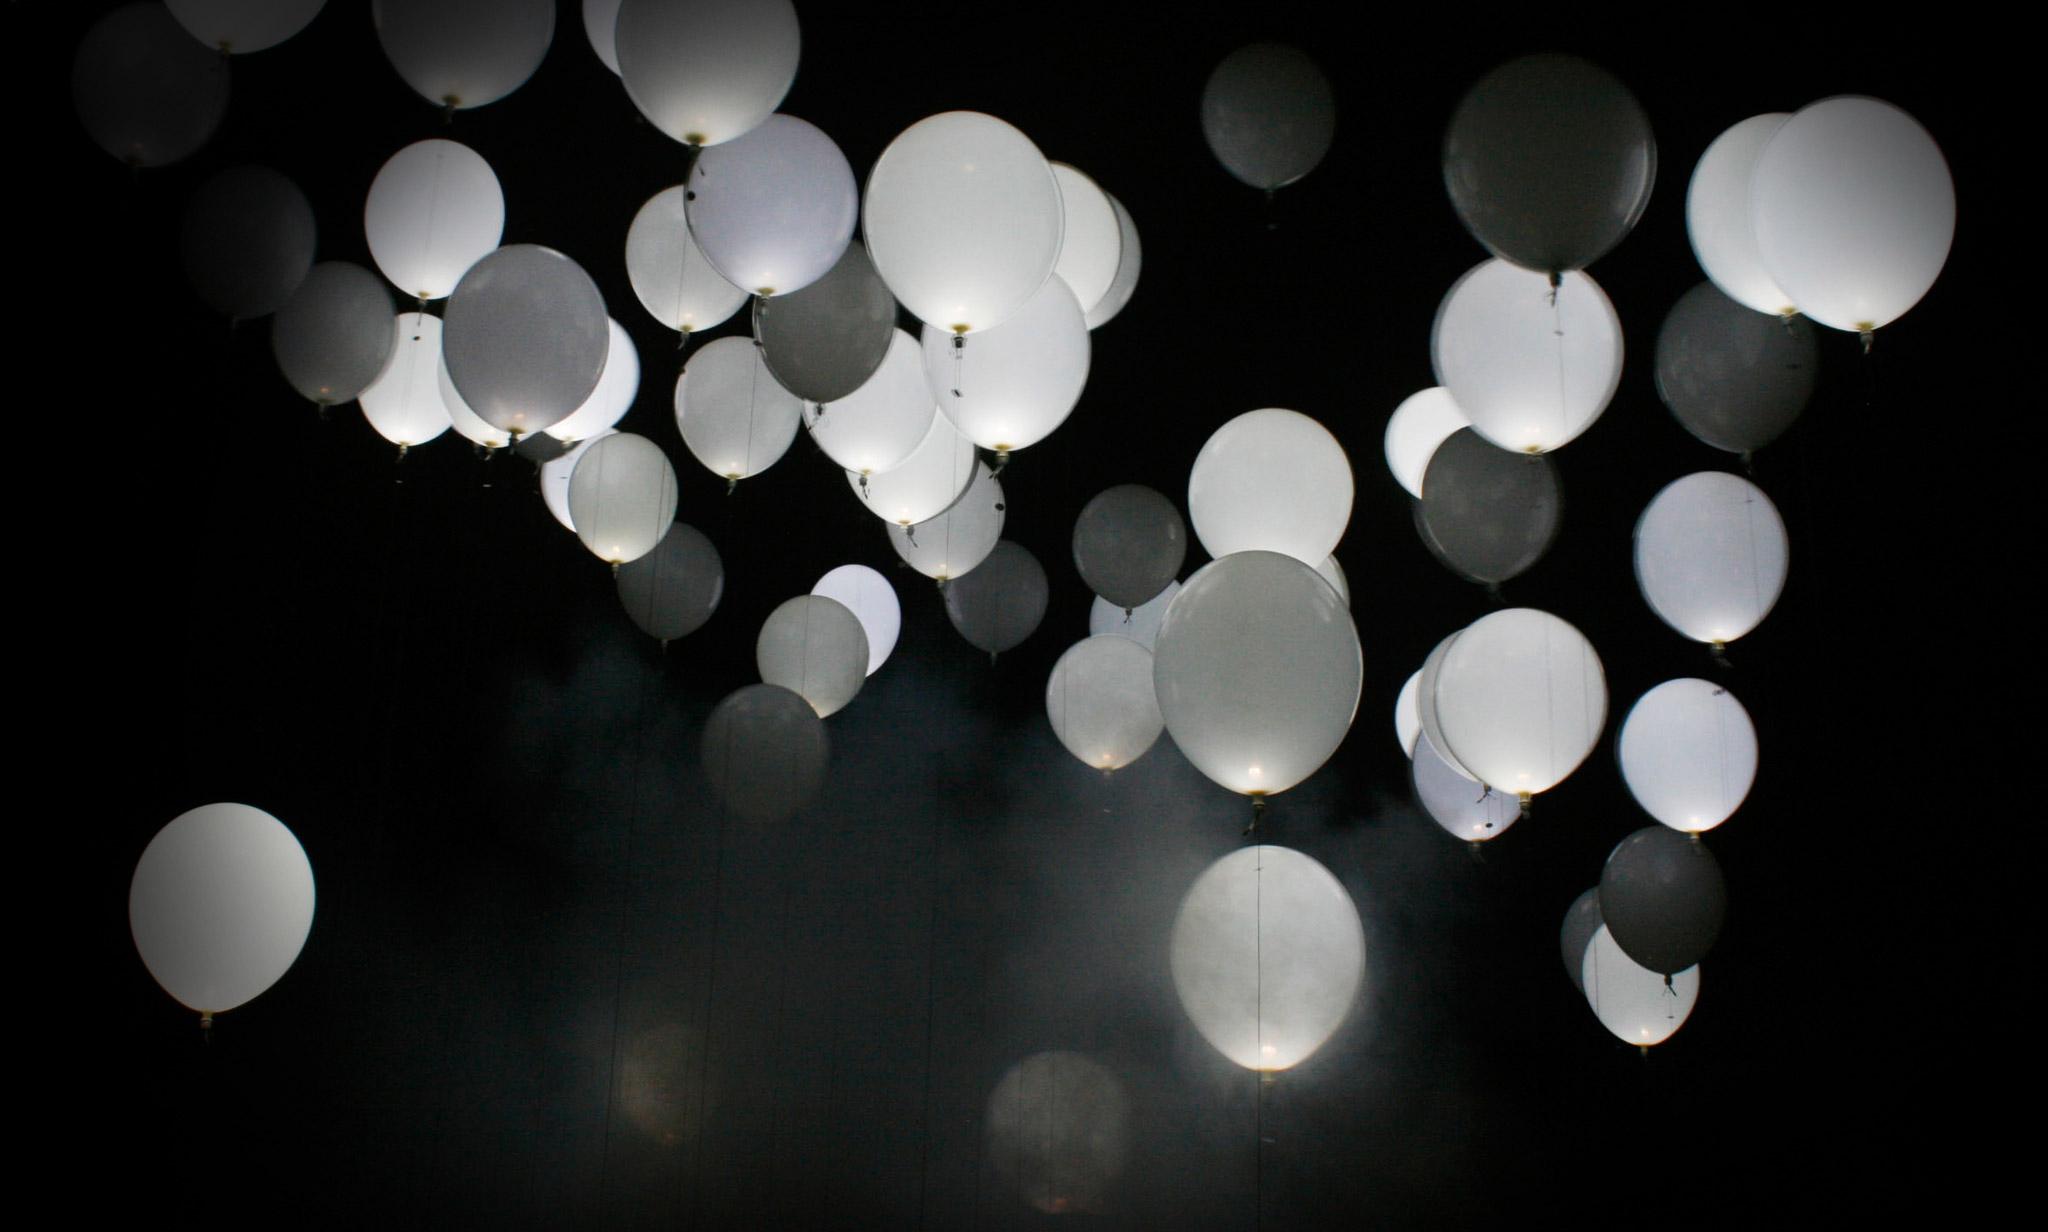 HQ Lights Wallpapers | File 244.07Kb